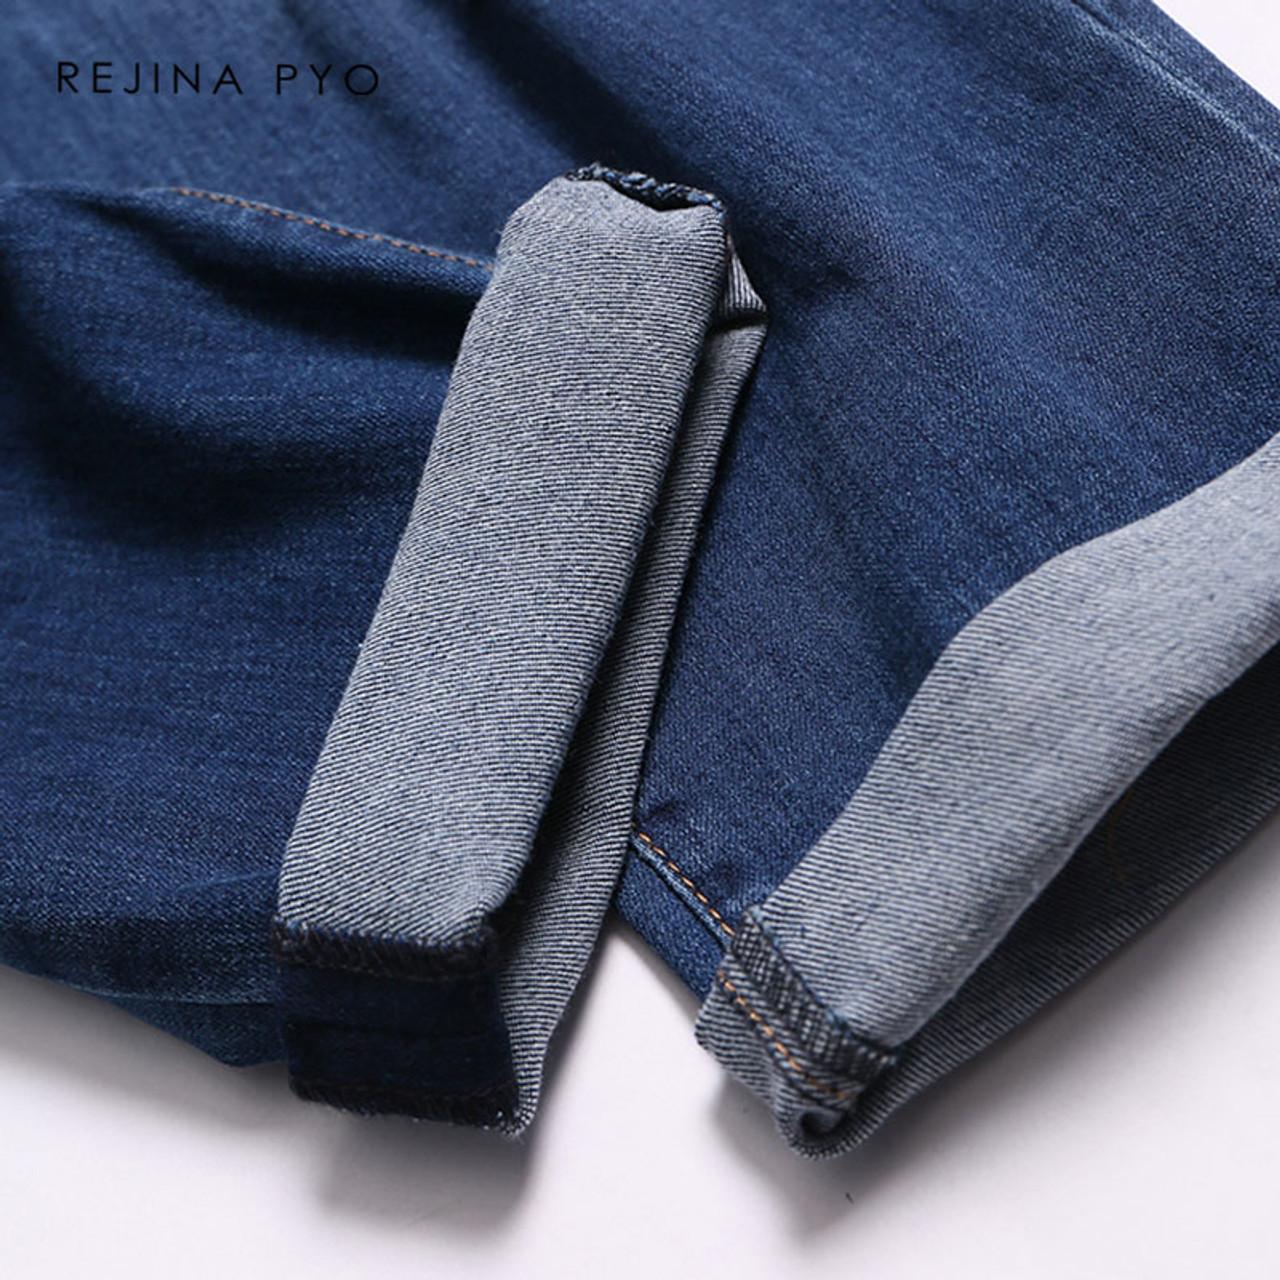 d226e99baad6a ... REJINAPYO Women Fashion Elegant Plus Size Vintage Jeans Women Scratched  Holes Oversized Denim Loose Jeans Ladies ...